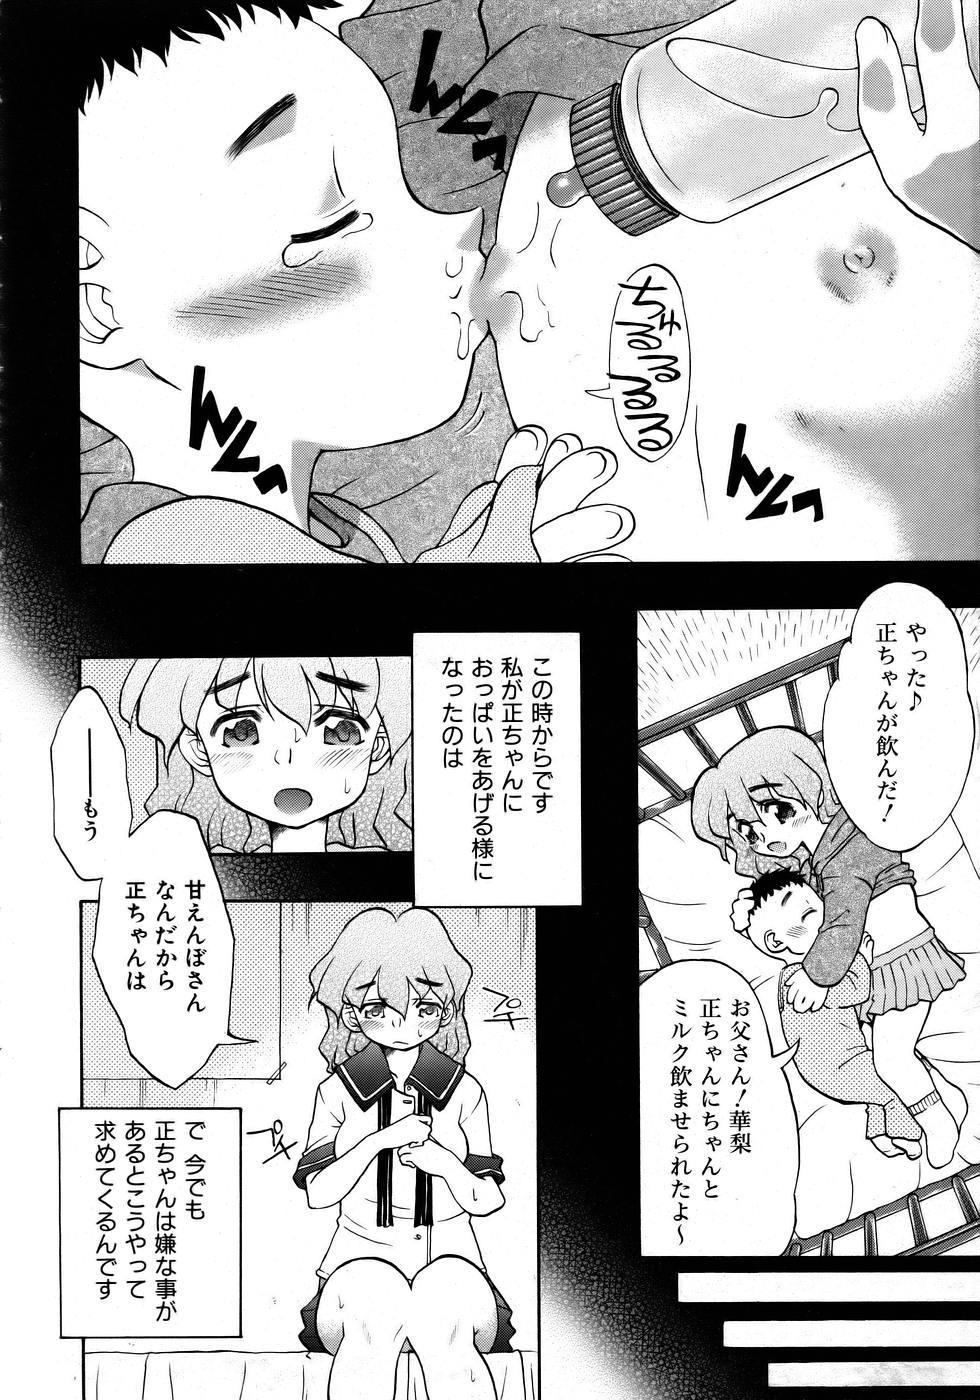 COMIC AUN 2005-12 Vol. 115 383